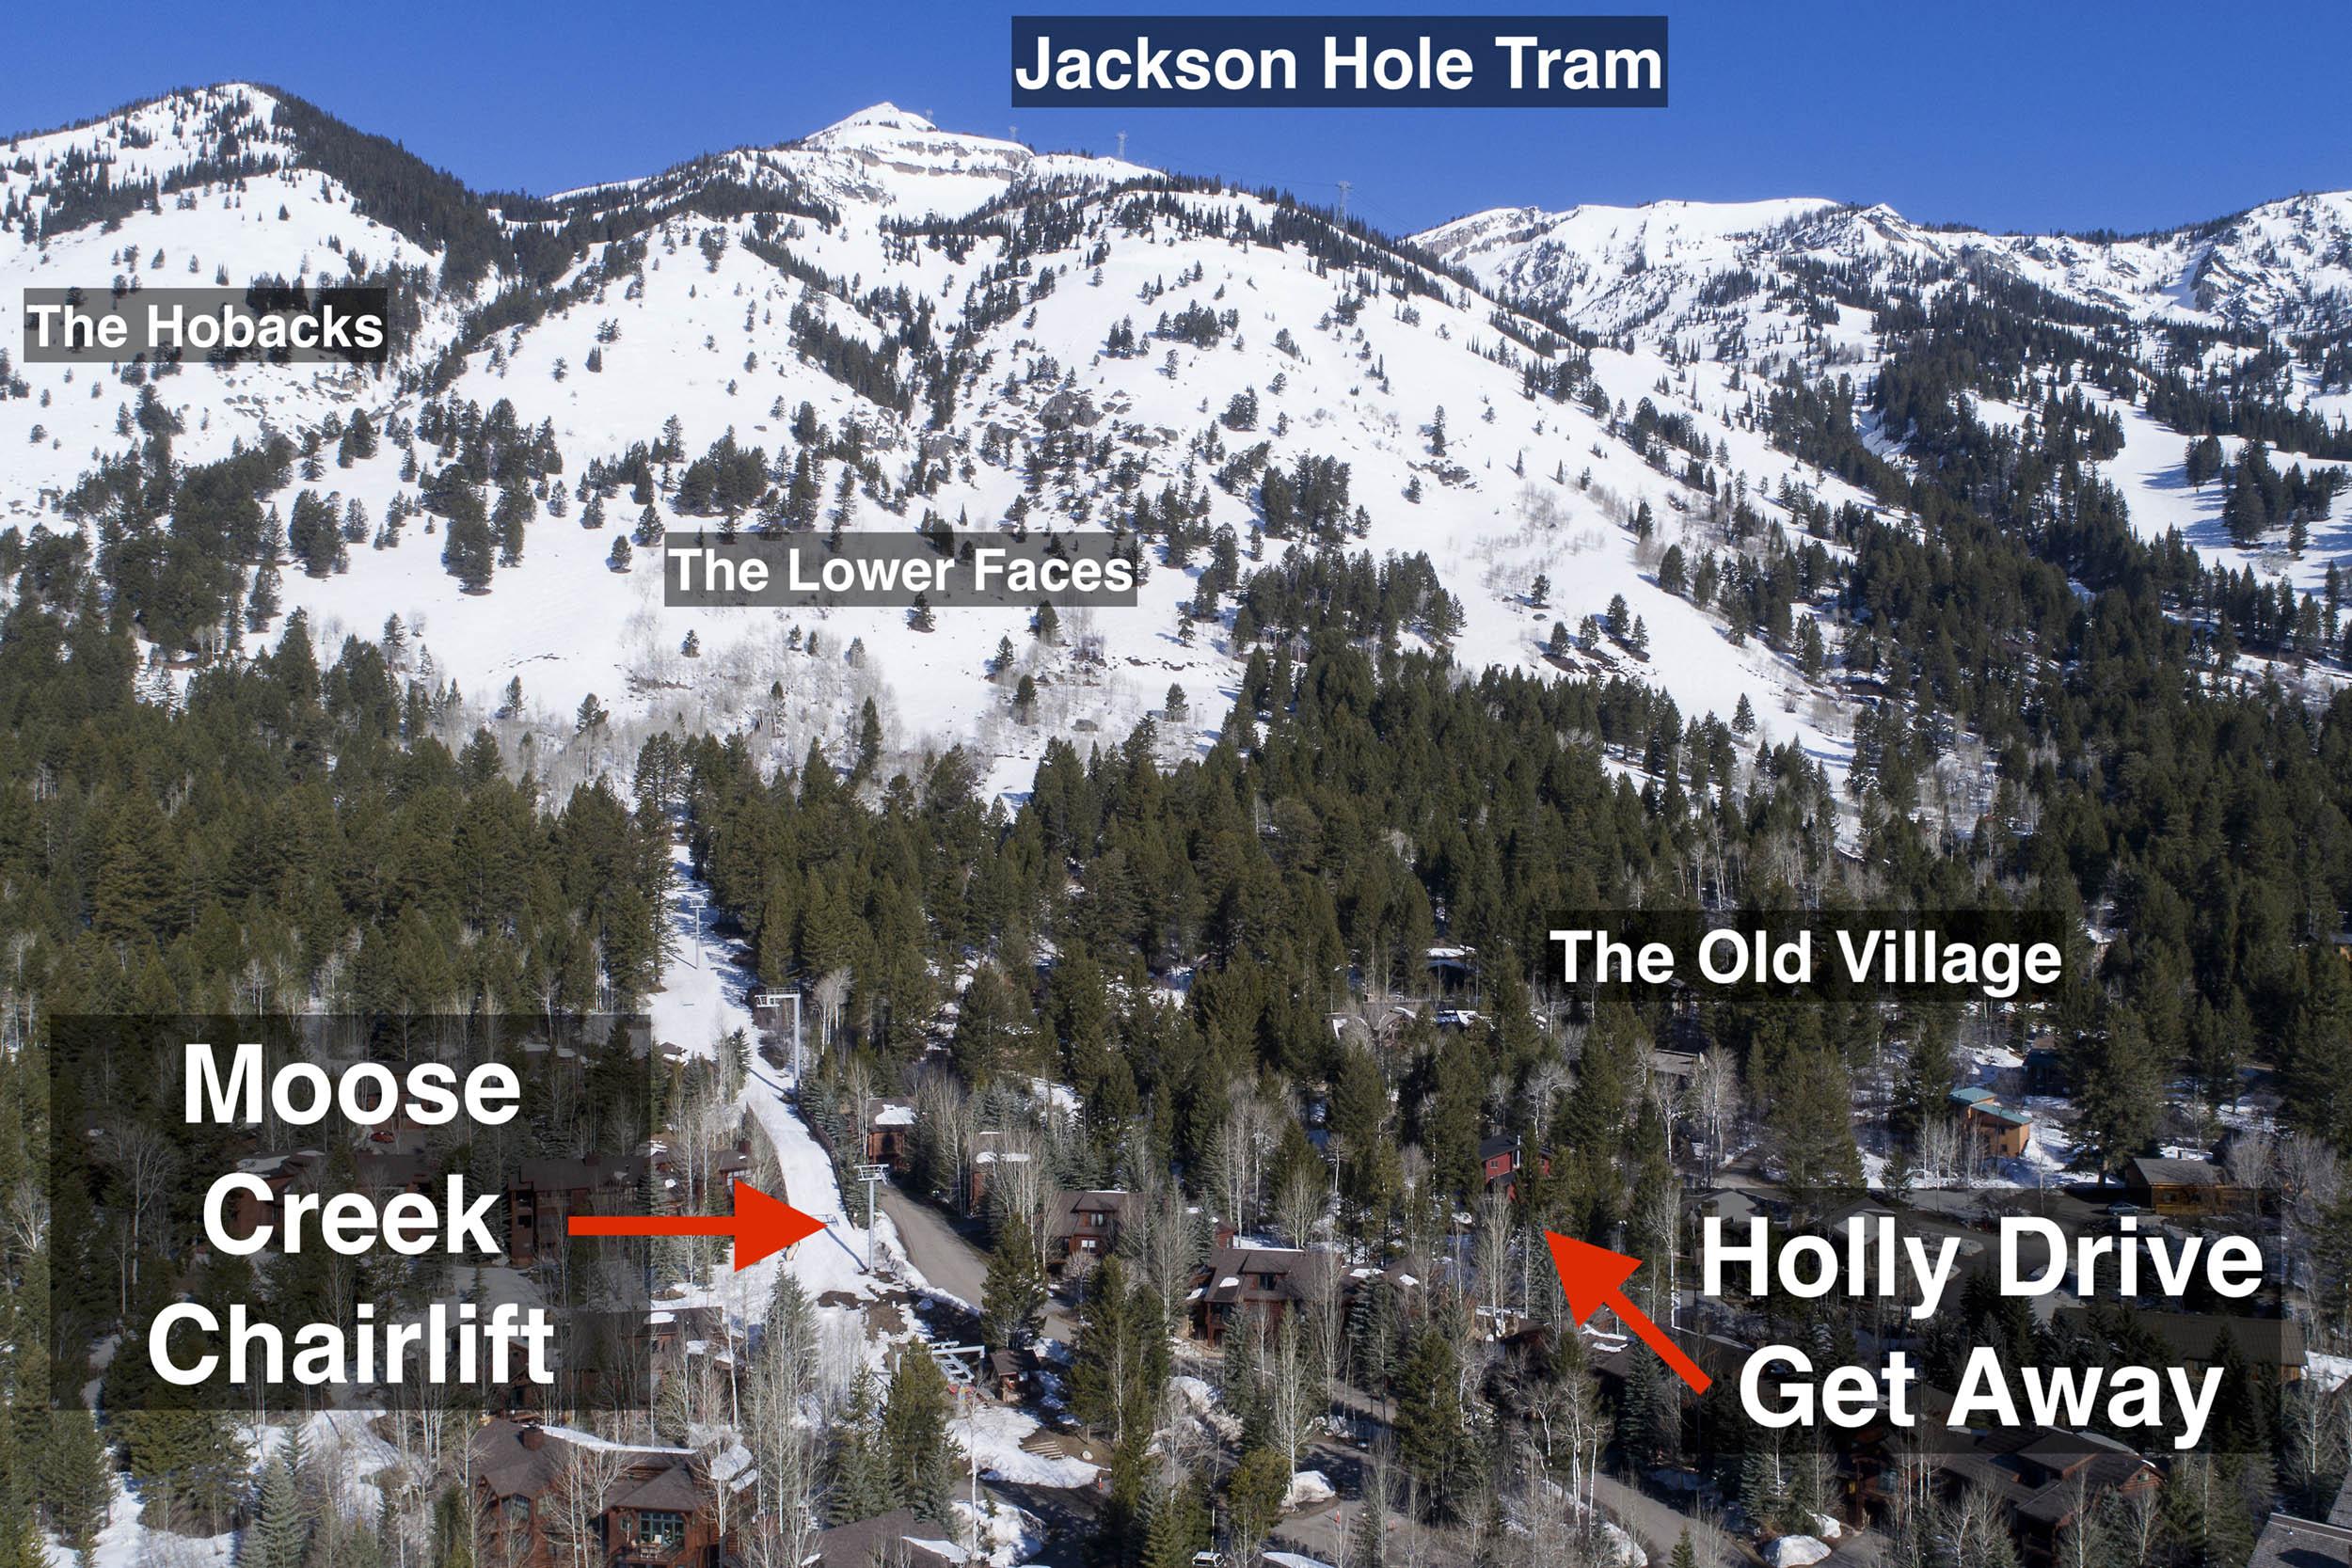 Teton Village Ski Real Estate - Holly Drive GetAway